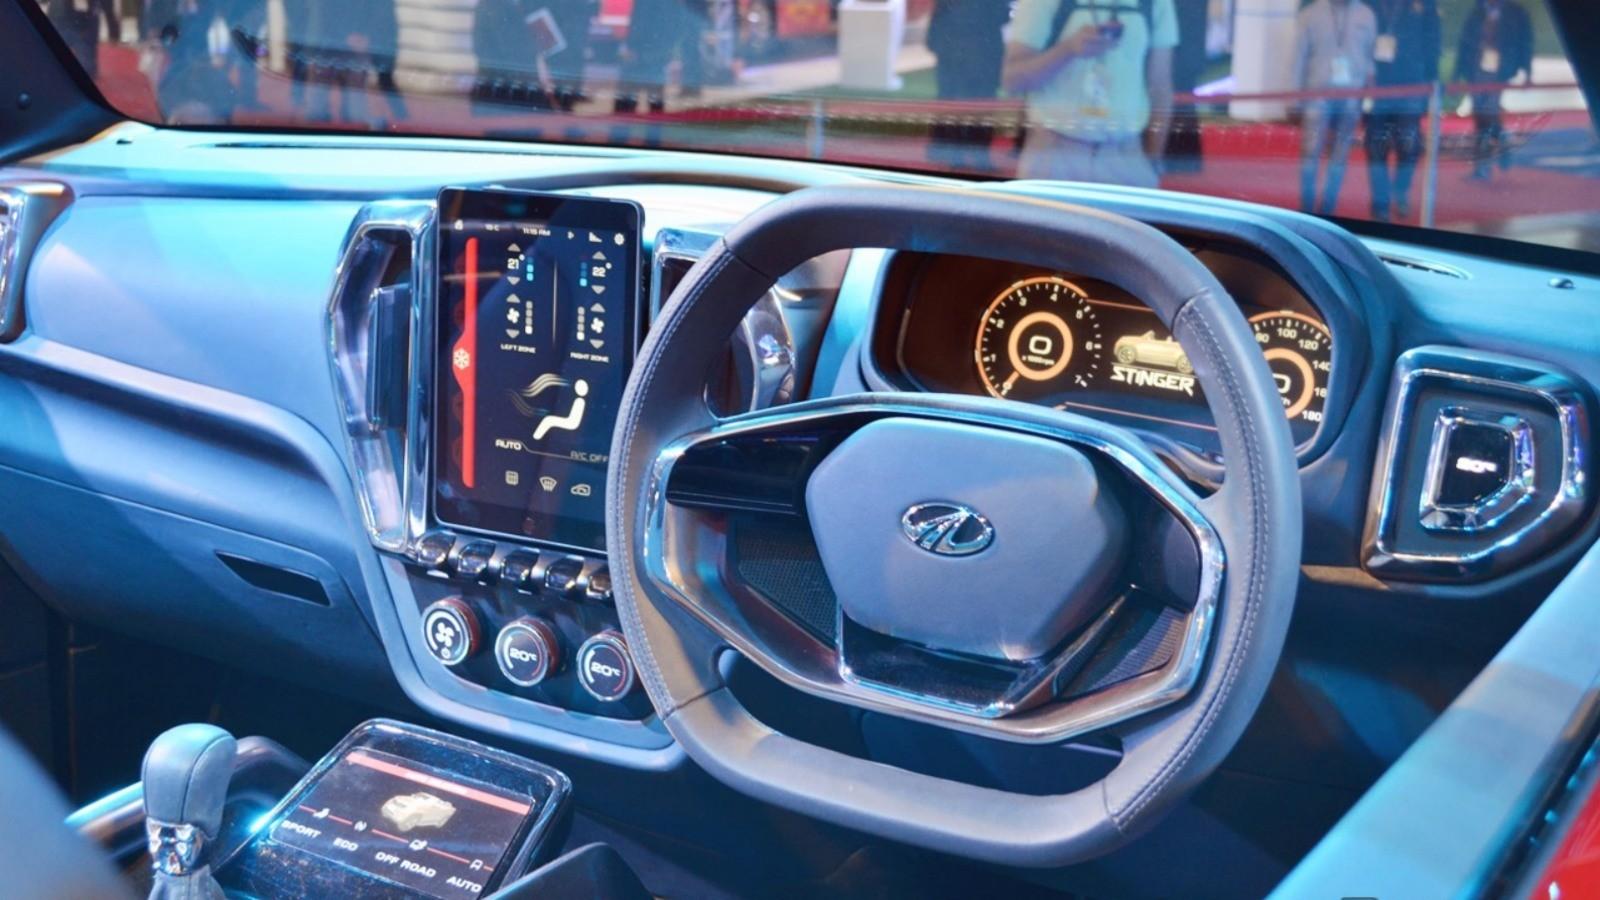 Mahindra-TUV-Stinger-concept-dashboard-at-Auto-Expo-2018